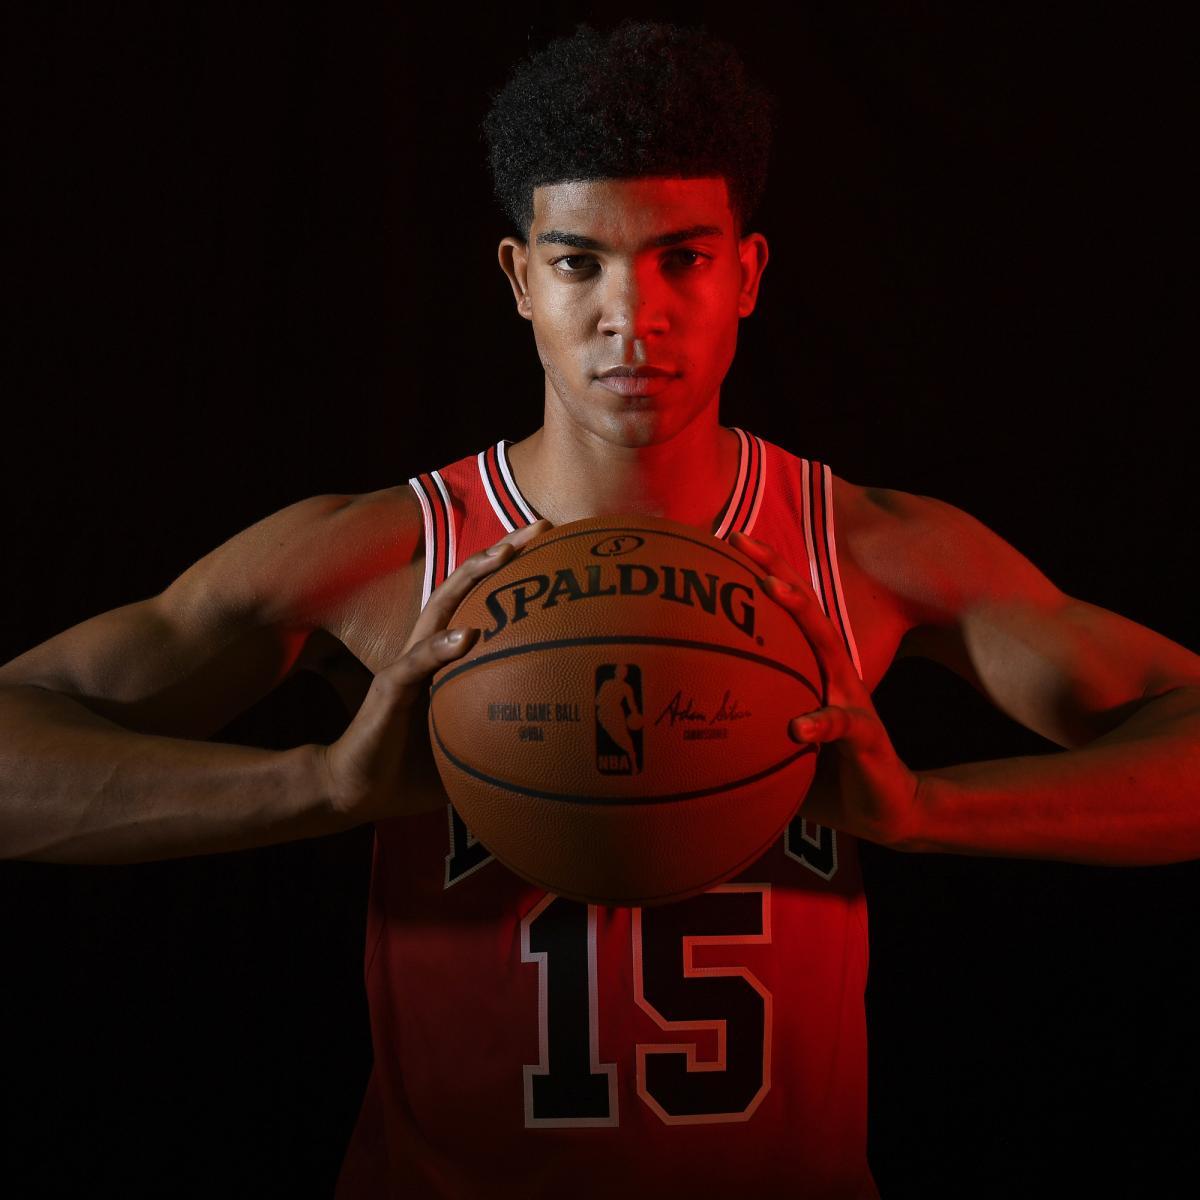 Nba Rookie Award Predictions For 2018 19 Season: Top 5 Rookie Small Forwards Entering 2018-19 NBA Season